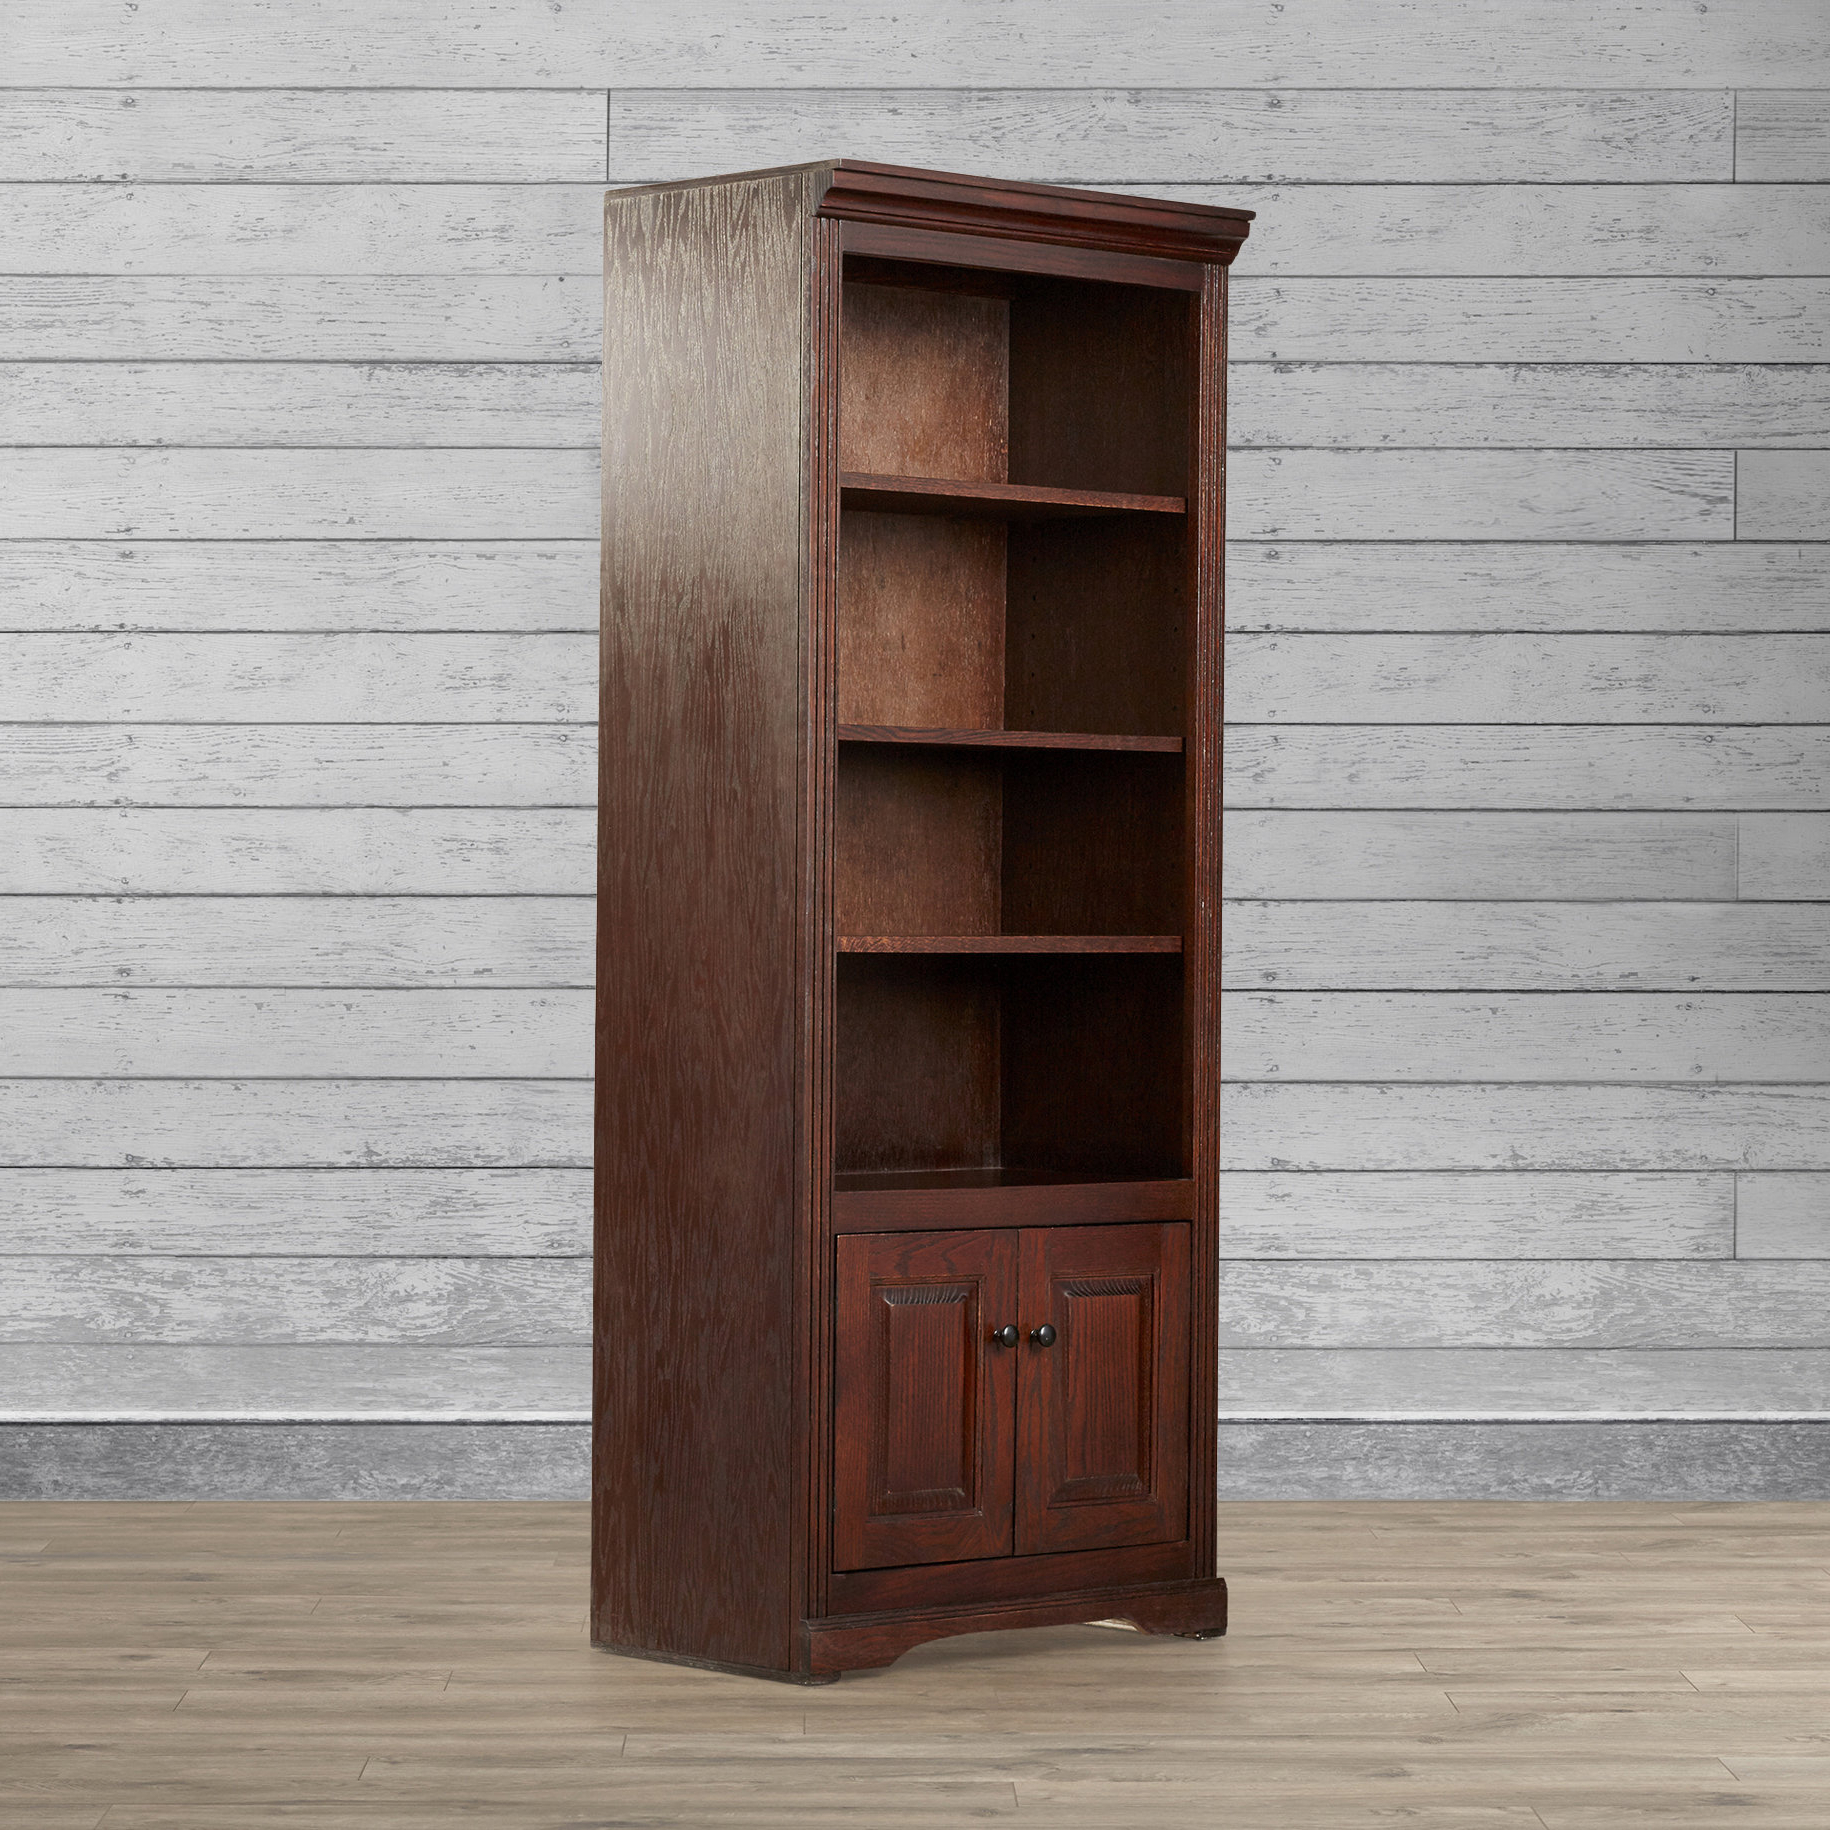 Reynoldsville Standard Bookcases Within Recent Glastonbury Standard Bookcase (View 11 of 20)